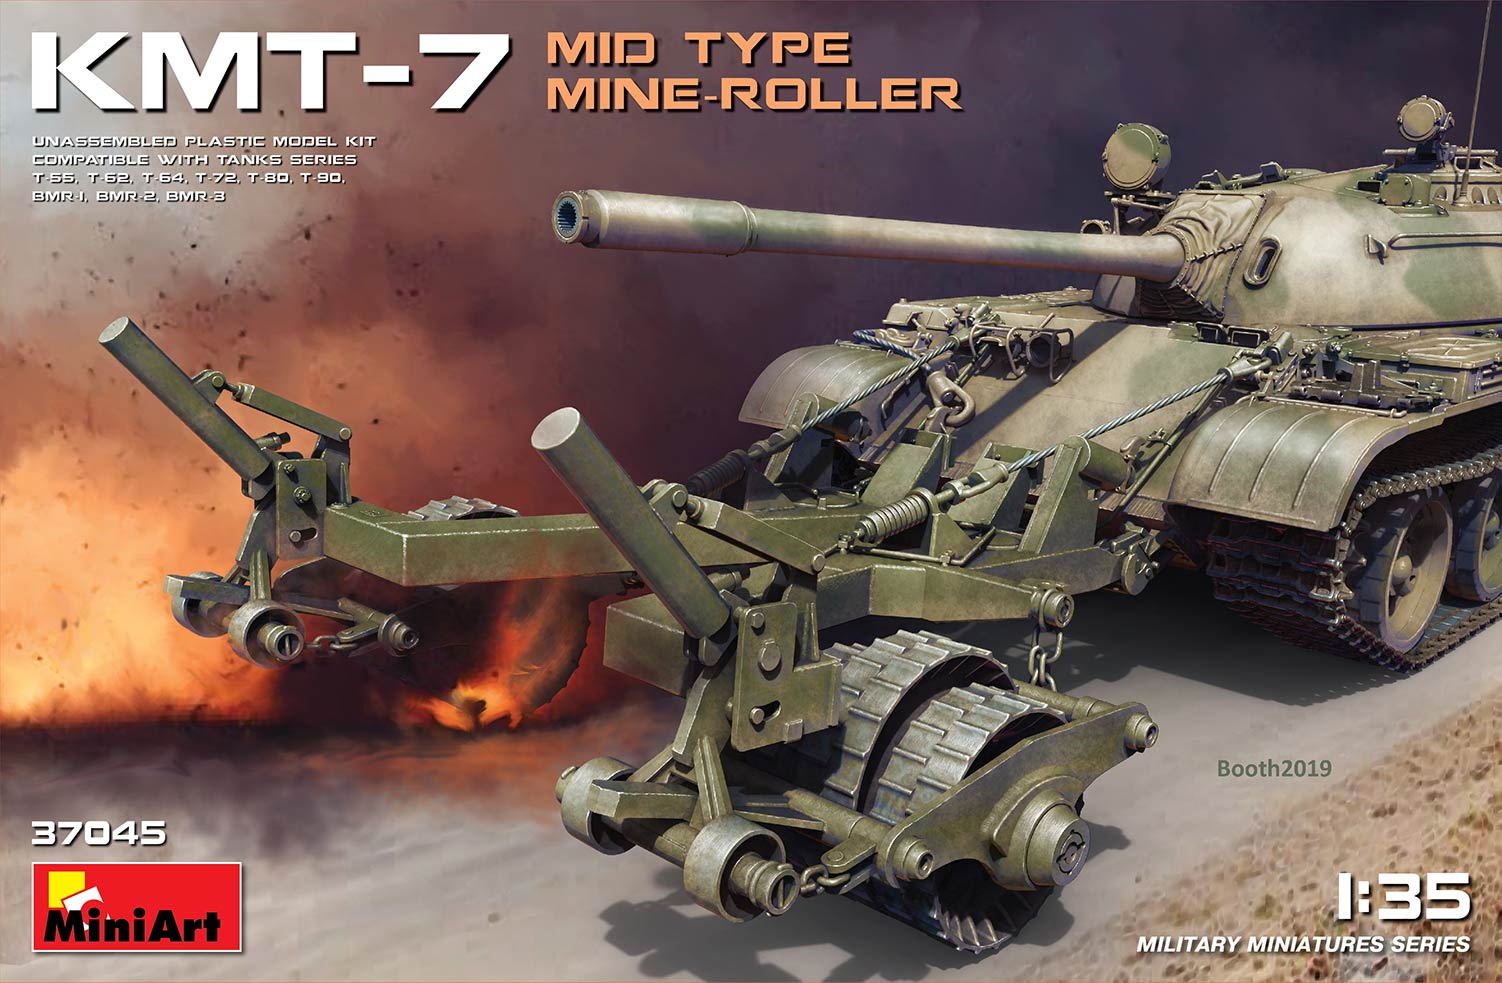 1/35 KMT-7 MID TYPE MINE-ROLLER 37045